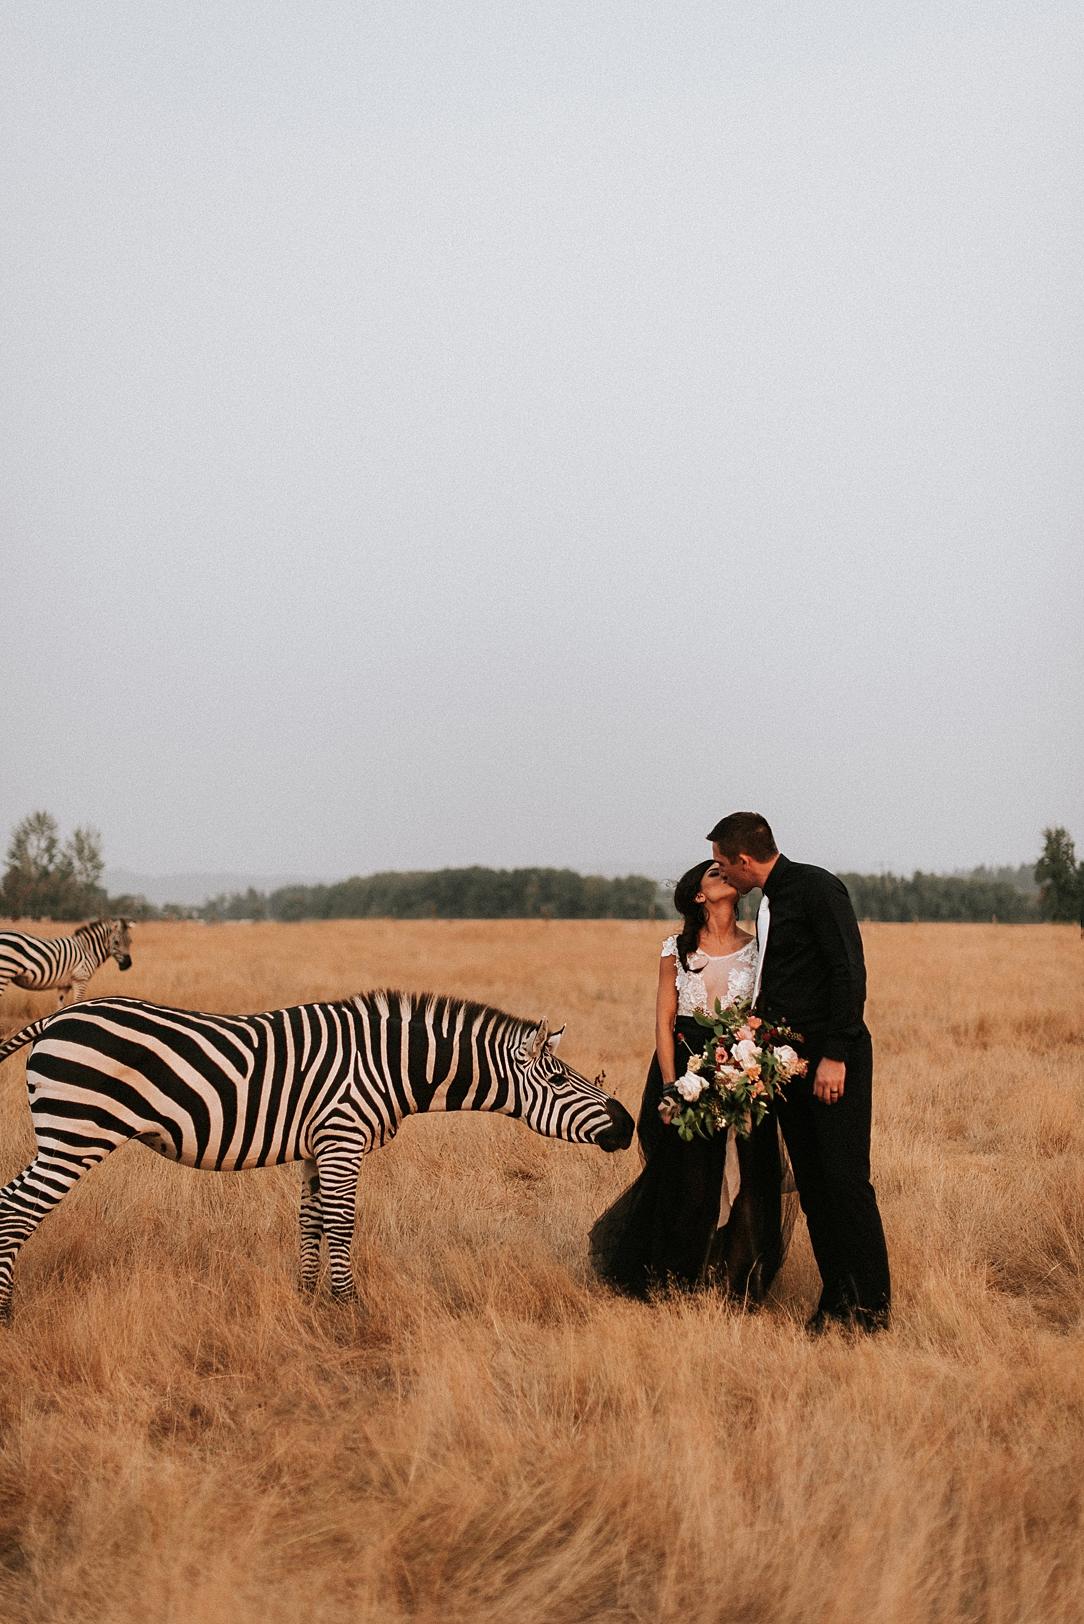 nbp-moody-safari_0002.jpg